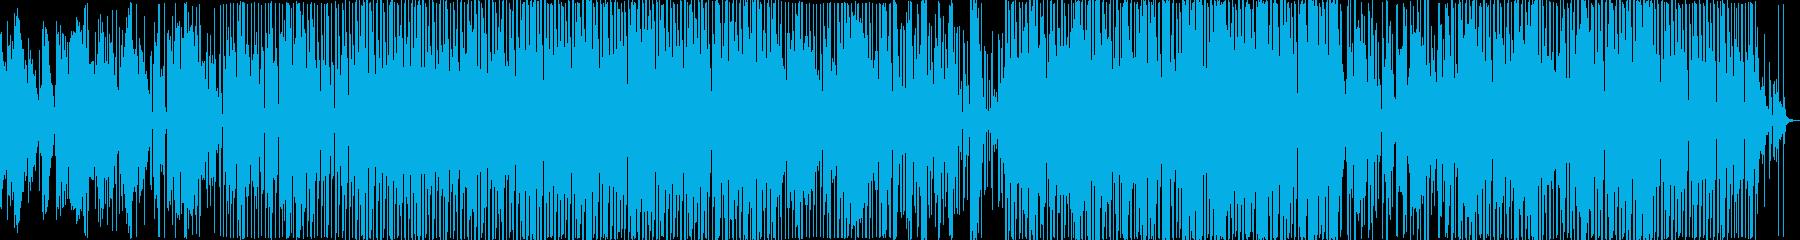 Latin 技術的な 電化 楽しげ...の再生済みの波形